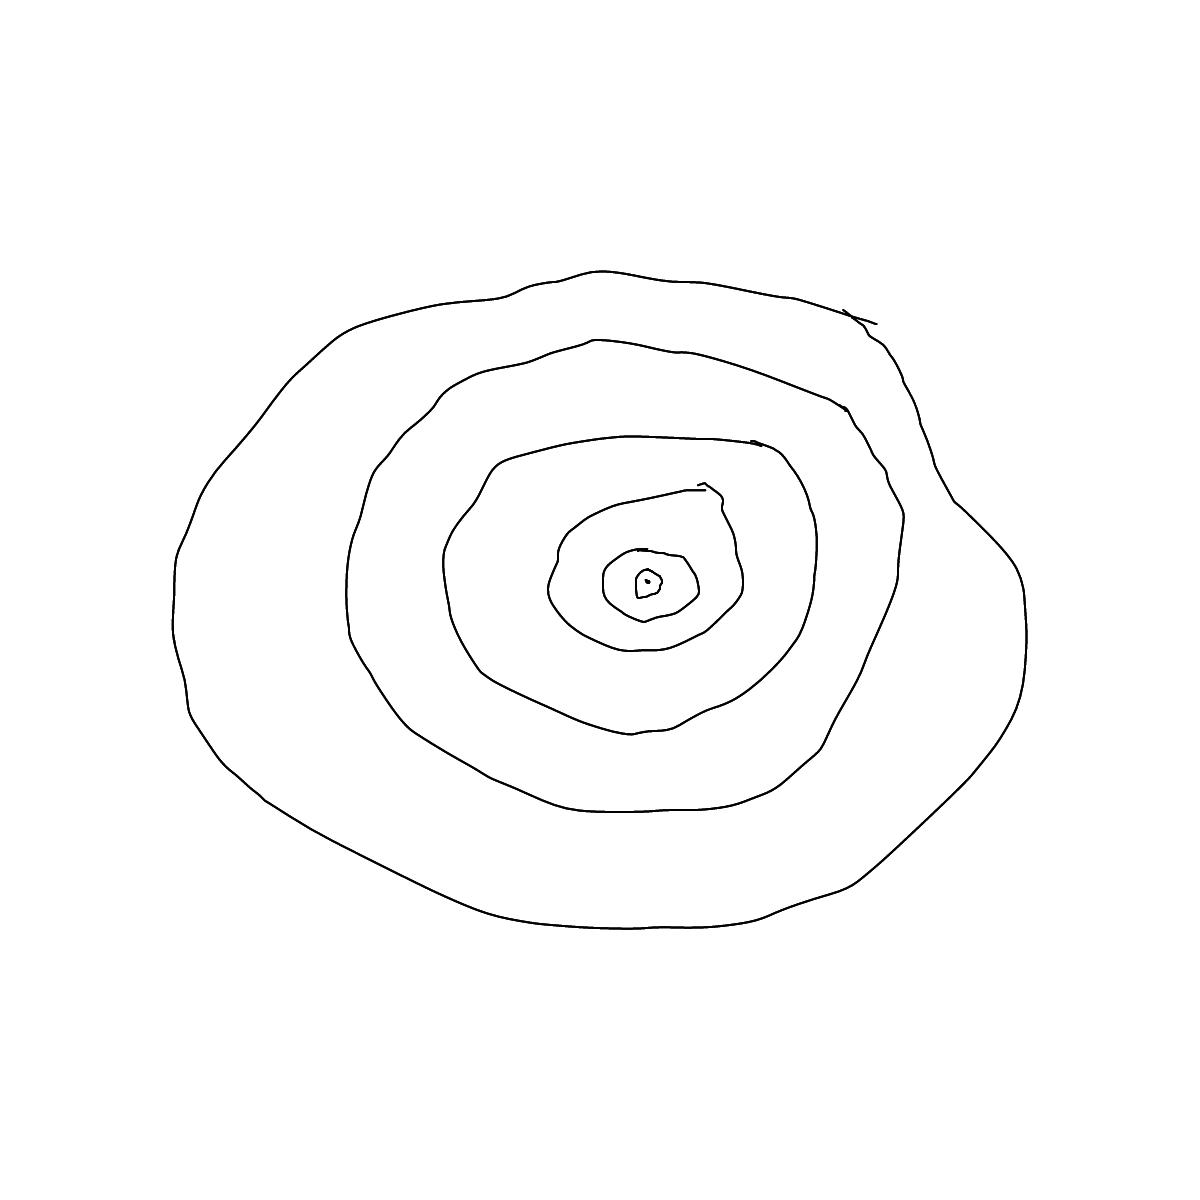 BAAAM drawing#9877 lat:35.7811660766601560lng: -78.6394042968750000